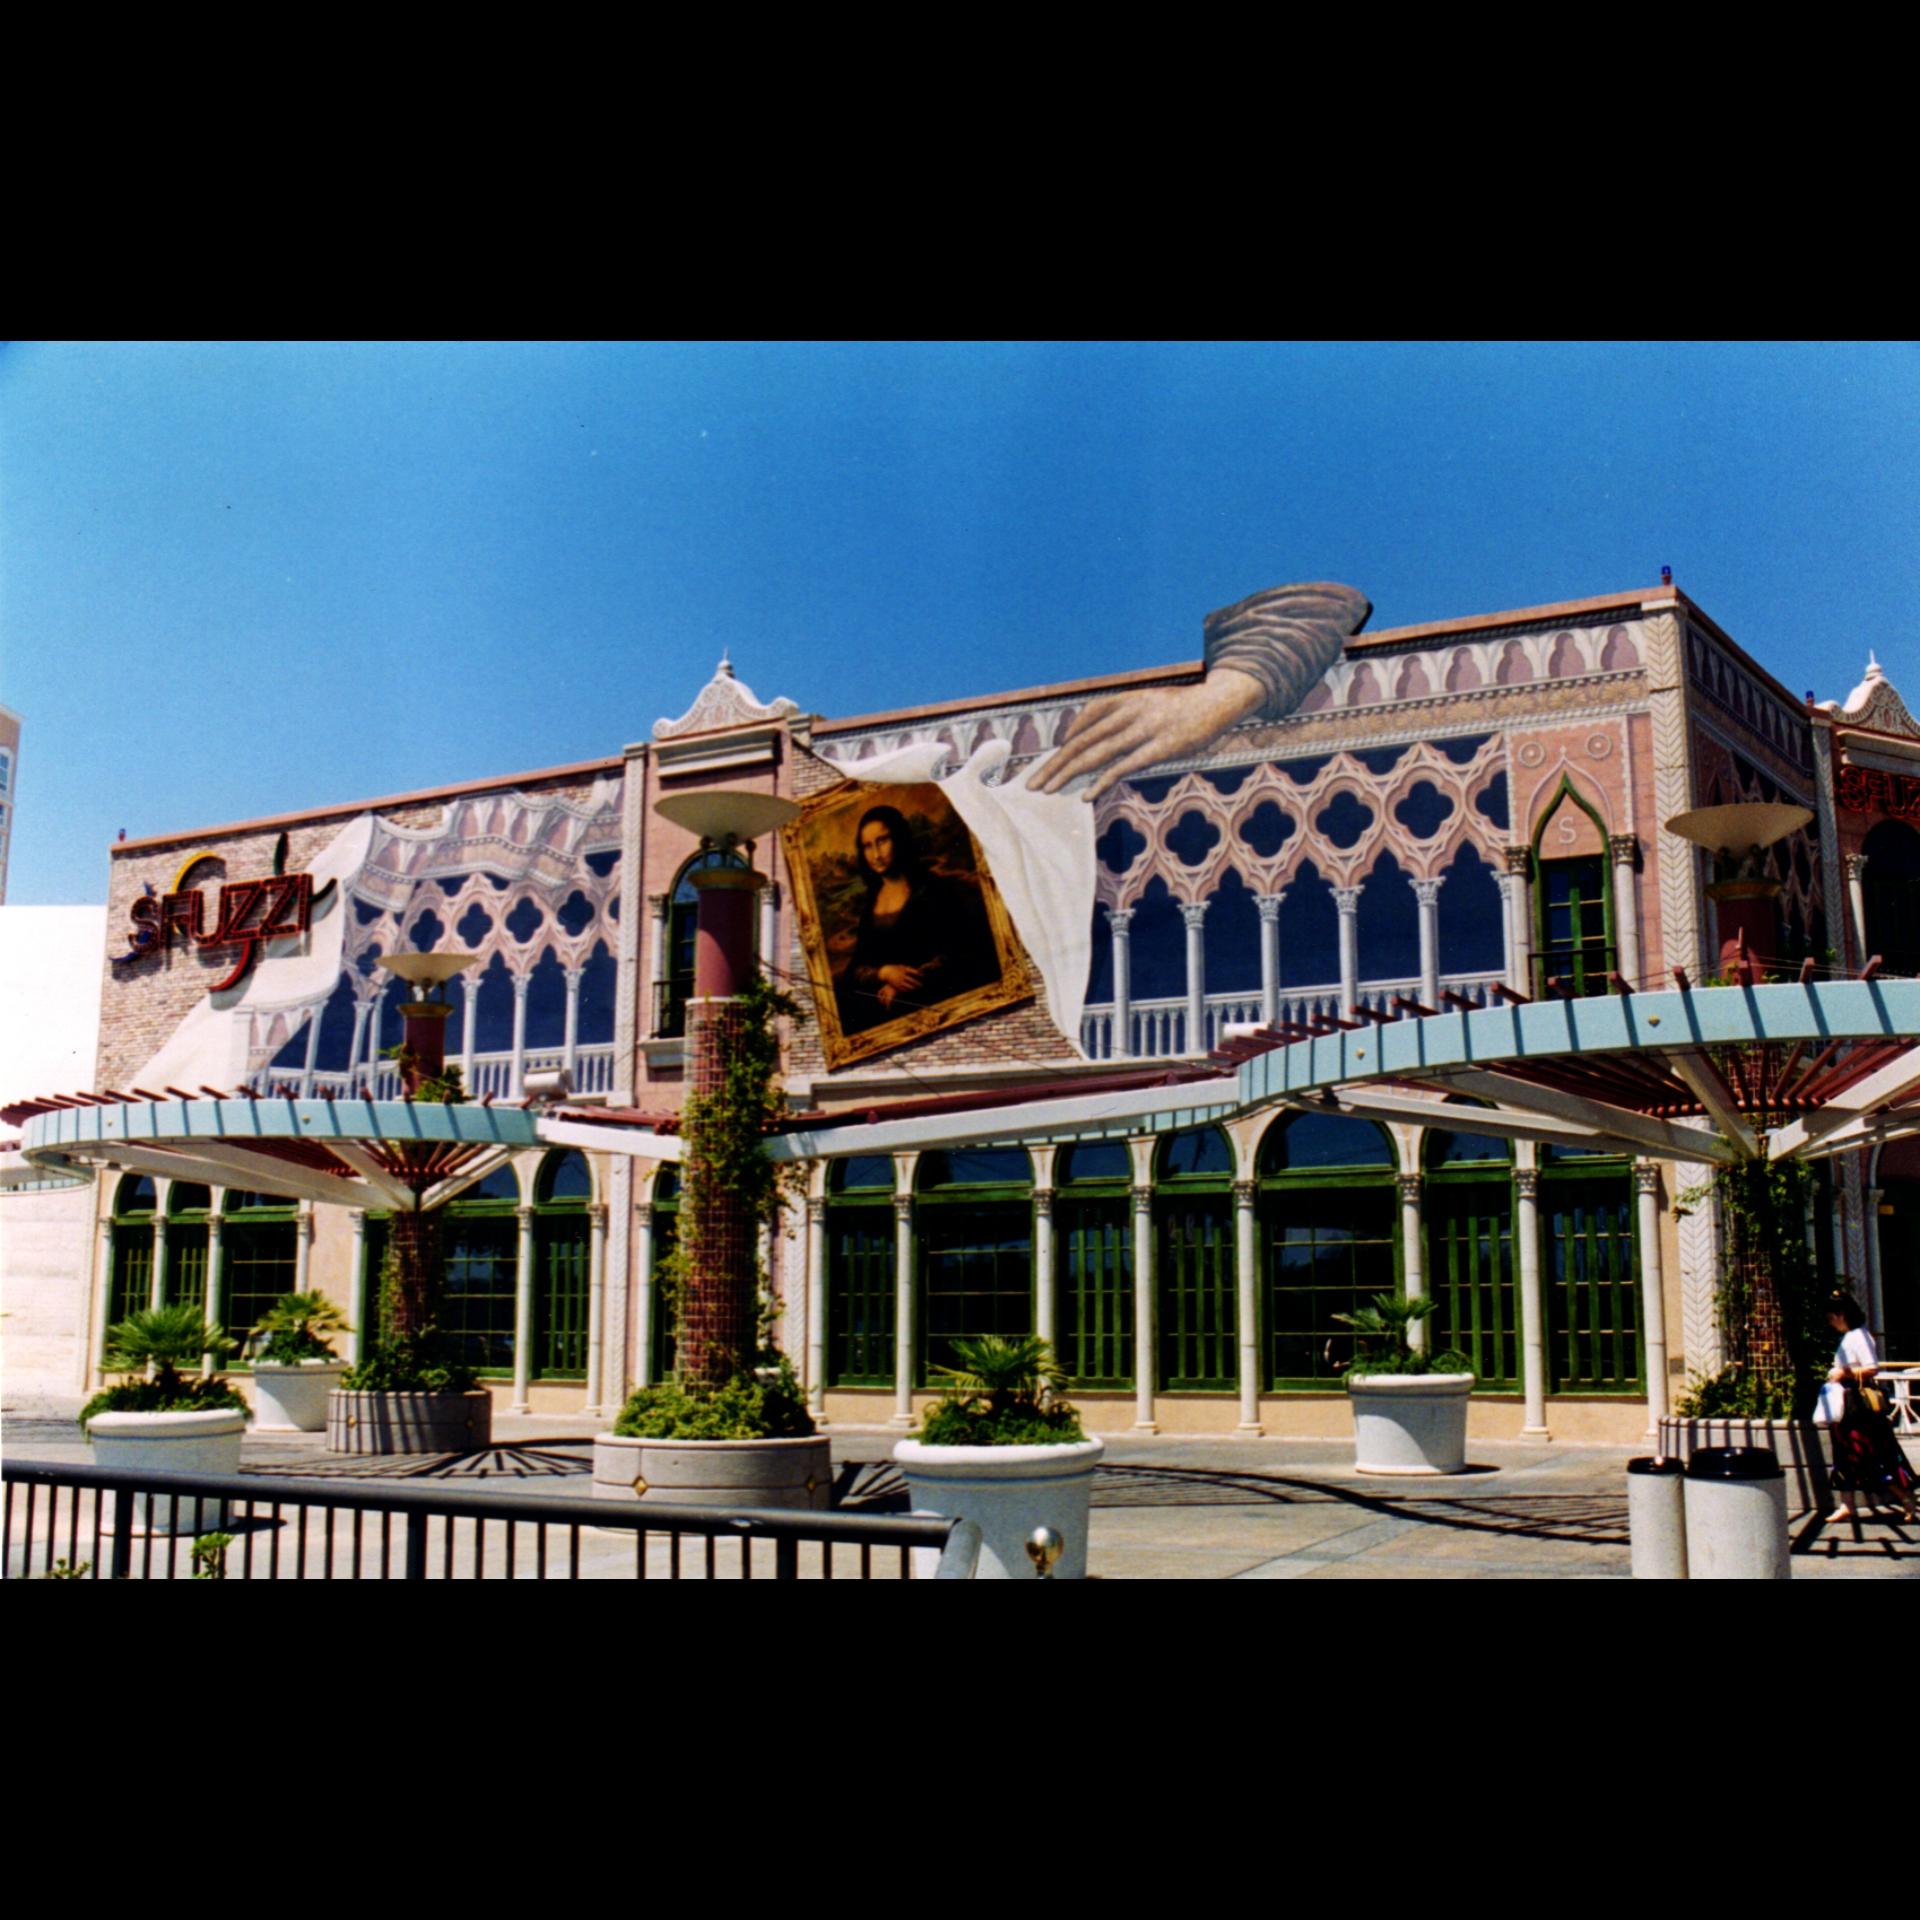 Mural_Las Vegas_1.jpg